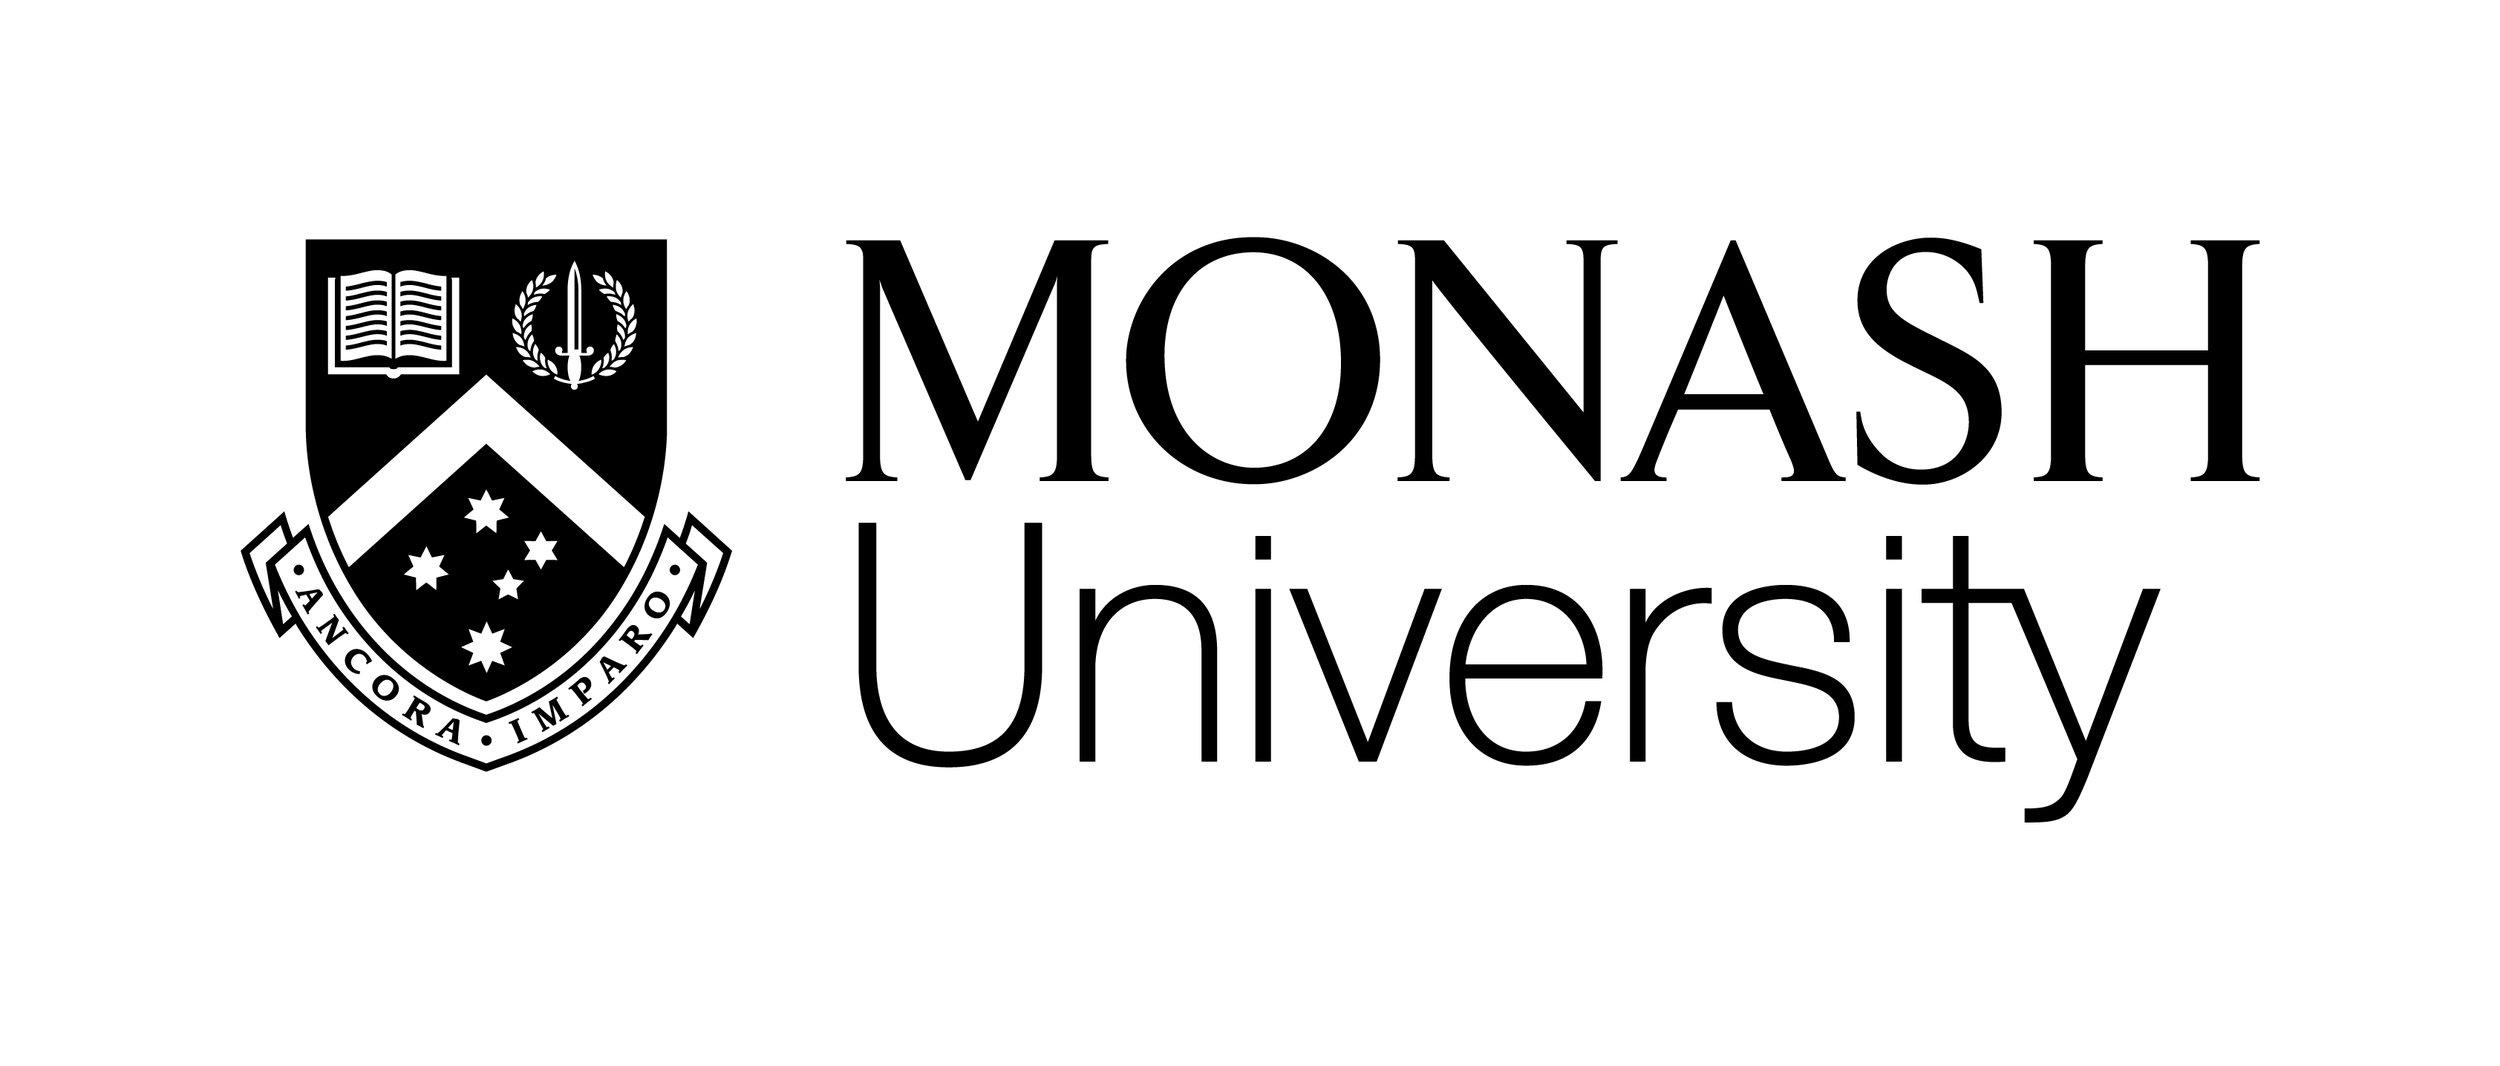 monash-university-logo.jpg